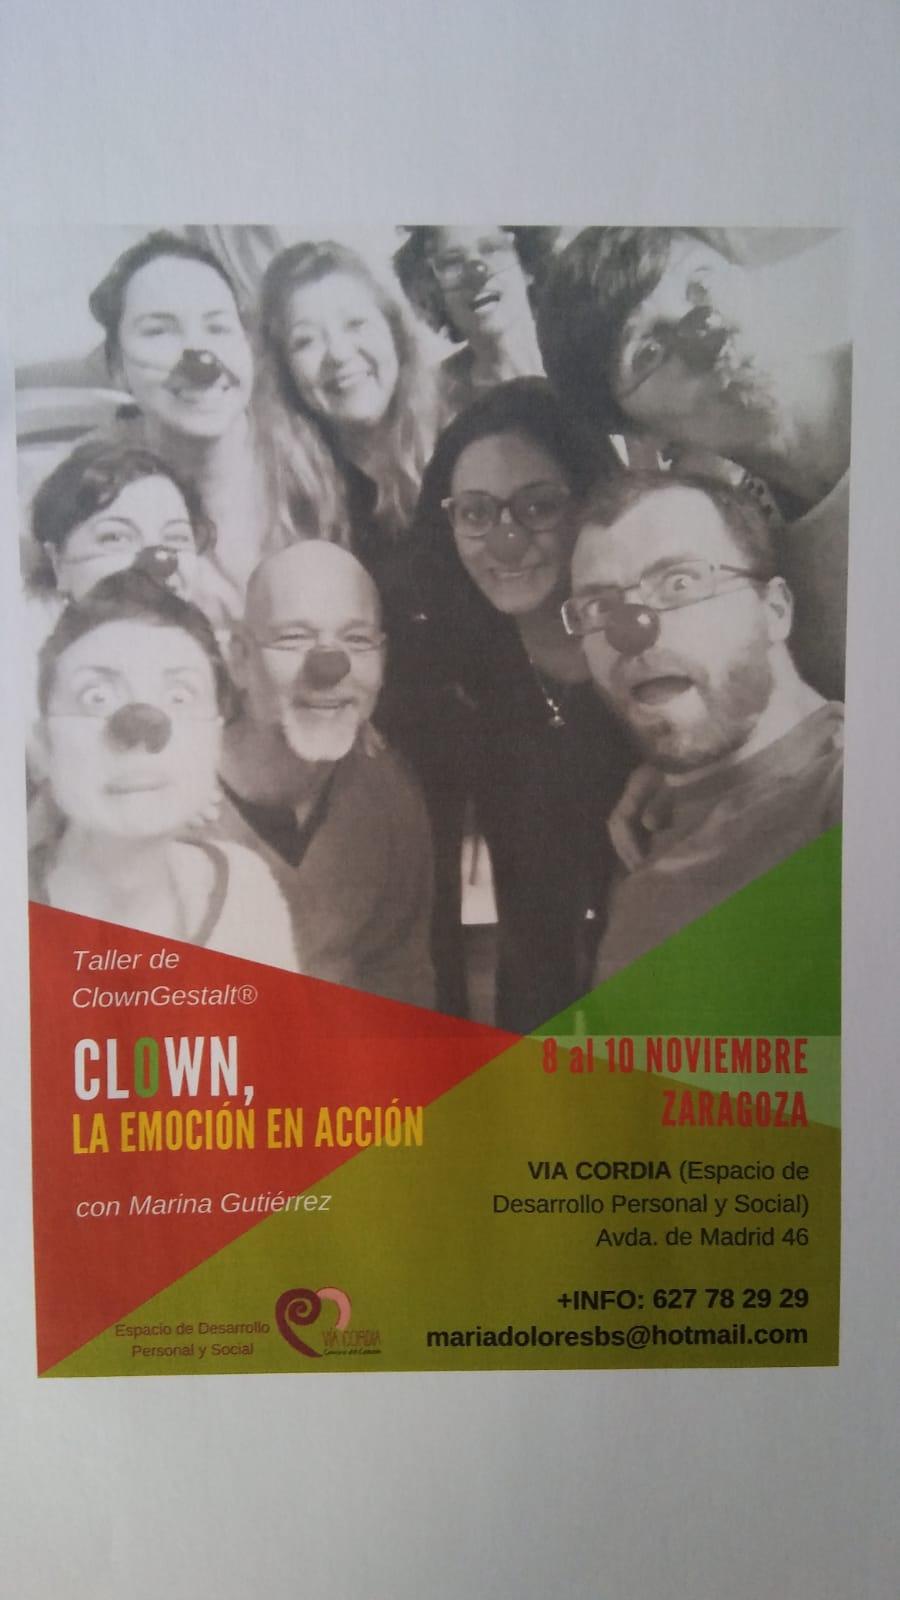 Clown Zaragoza